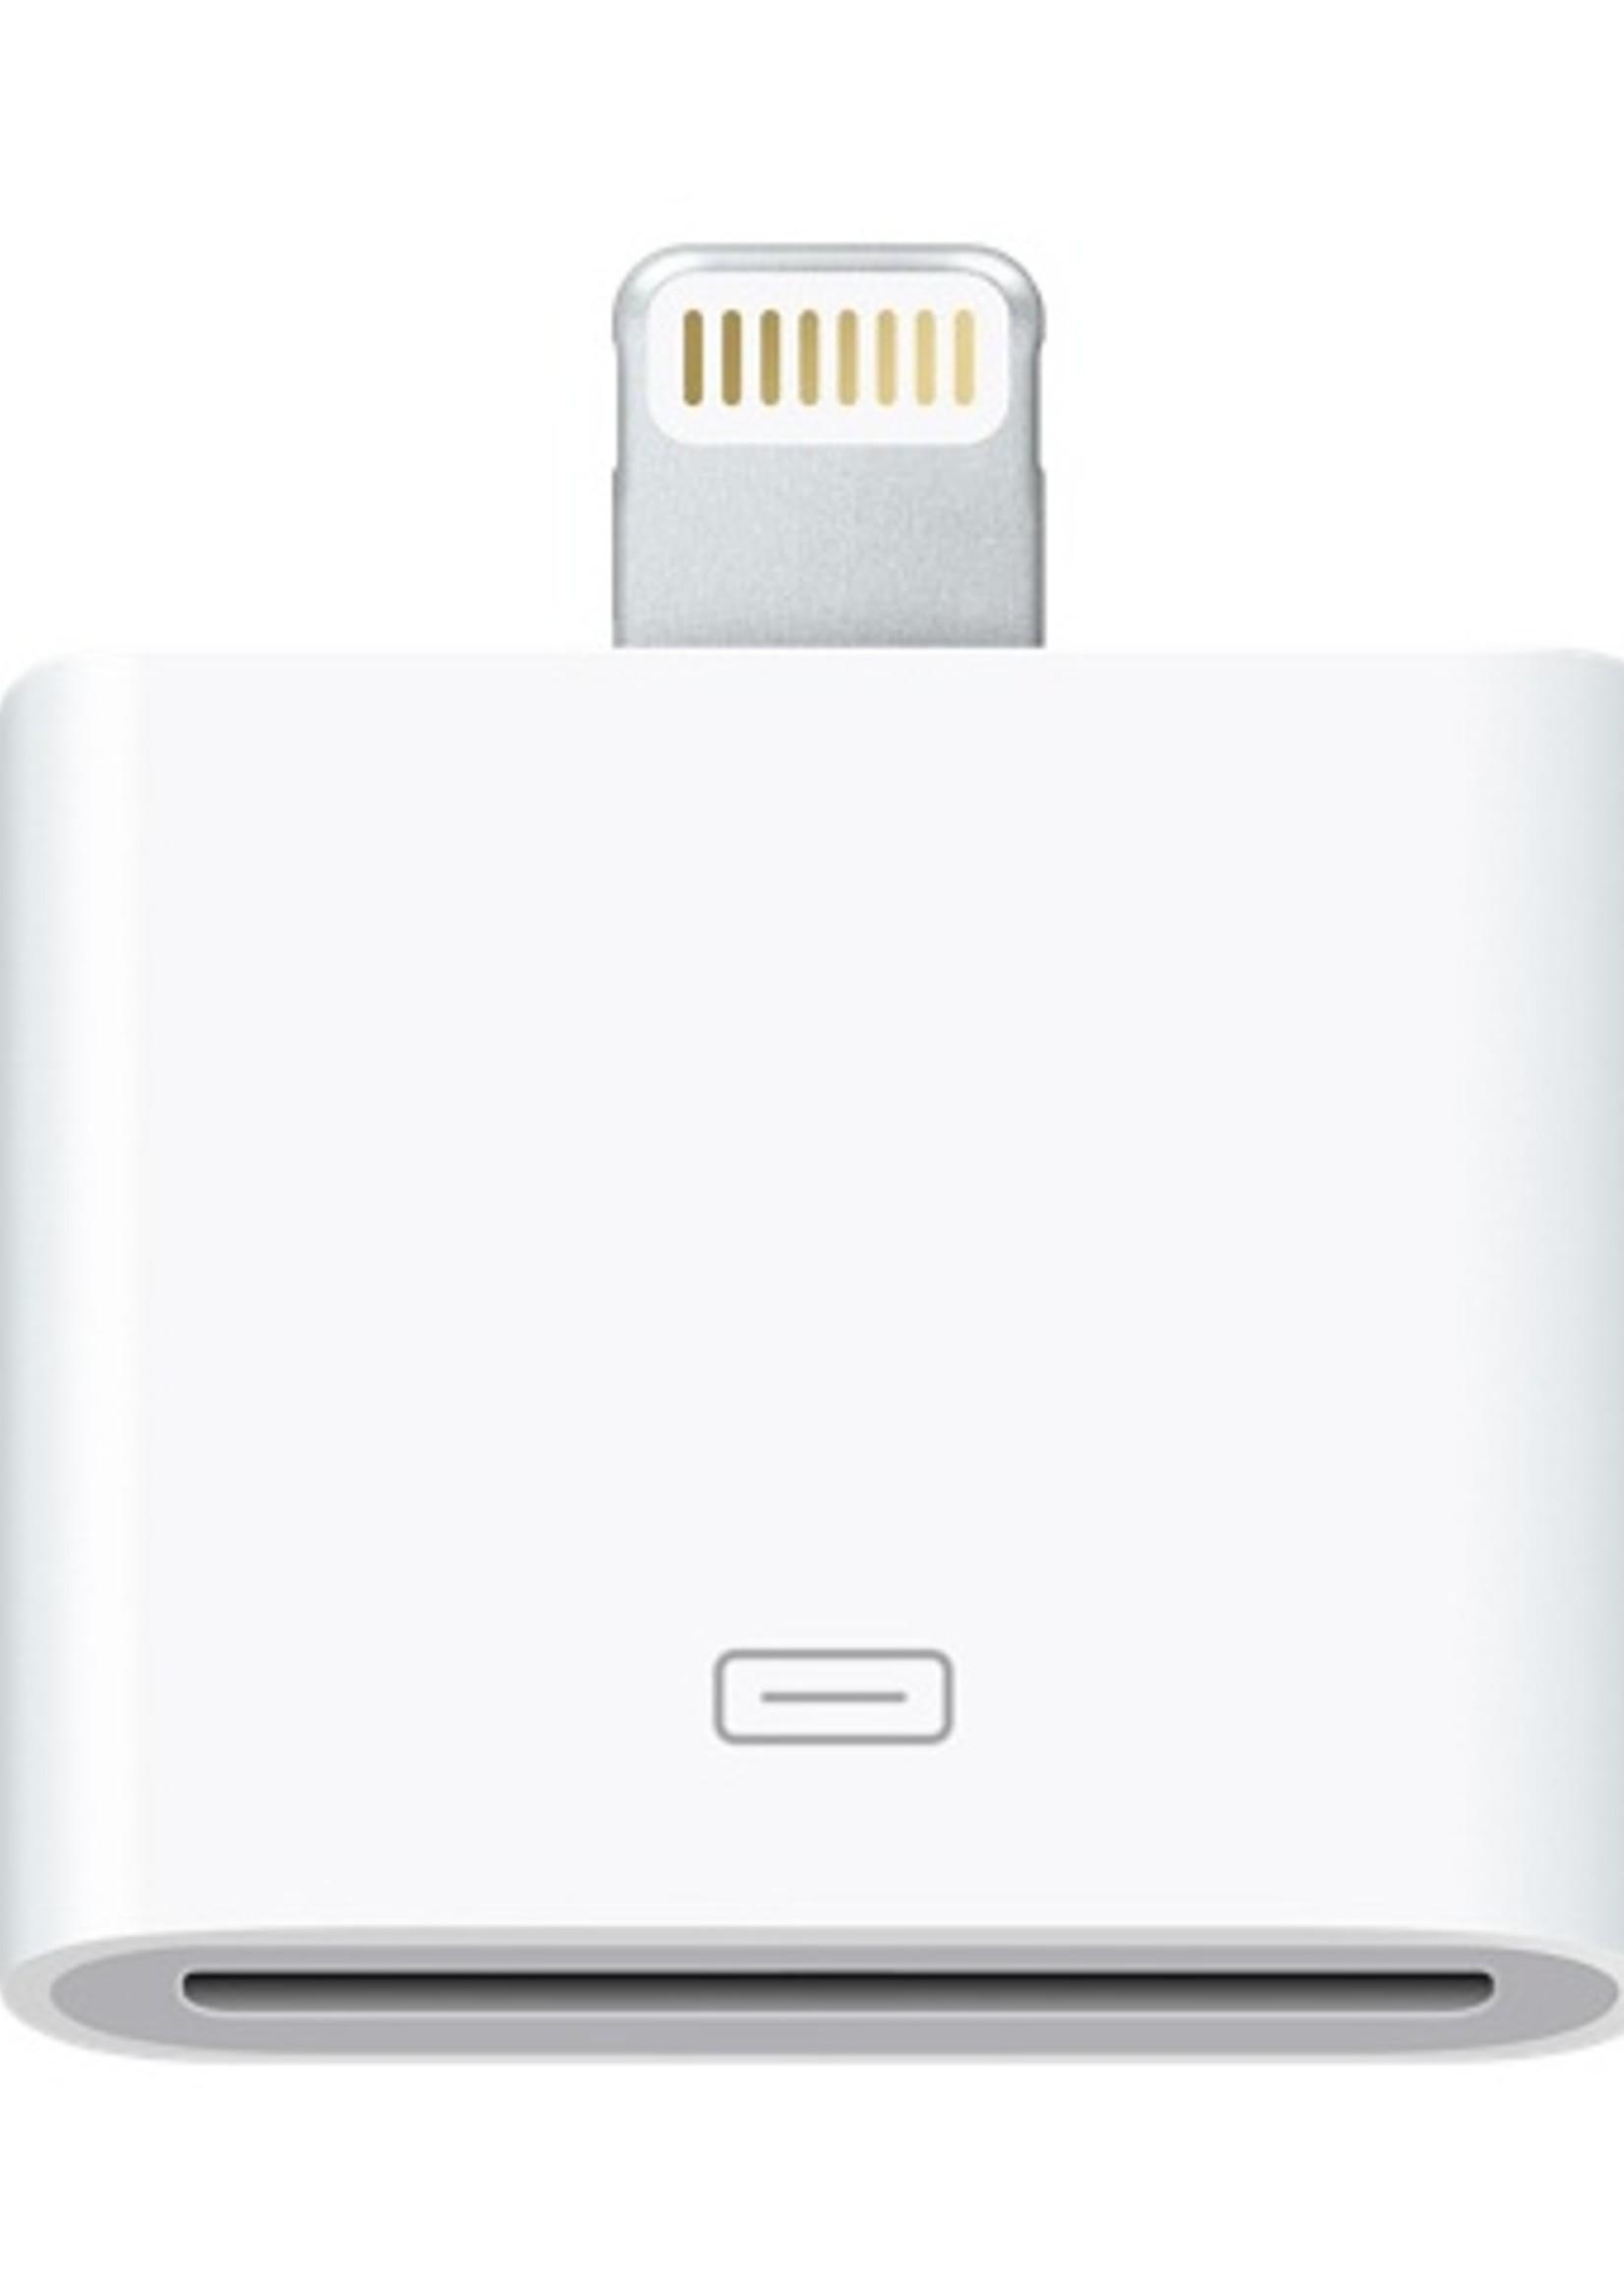 Lightning to 30-pin Adapter